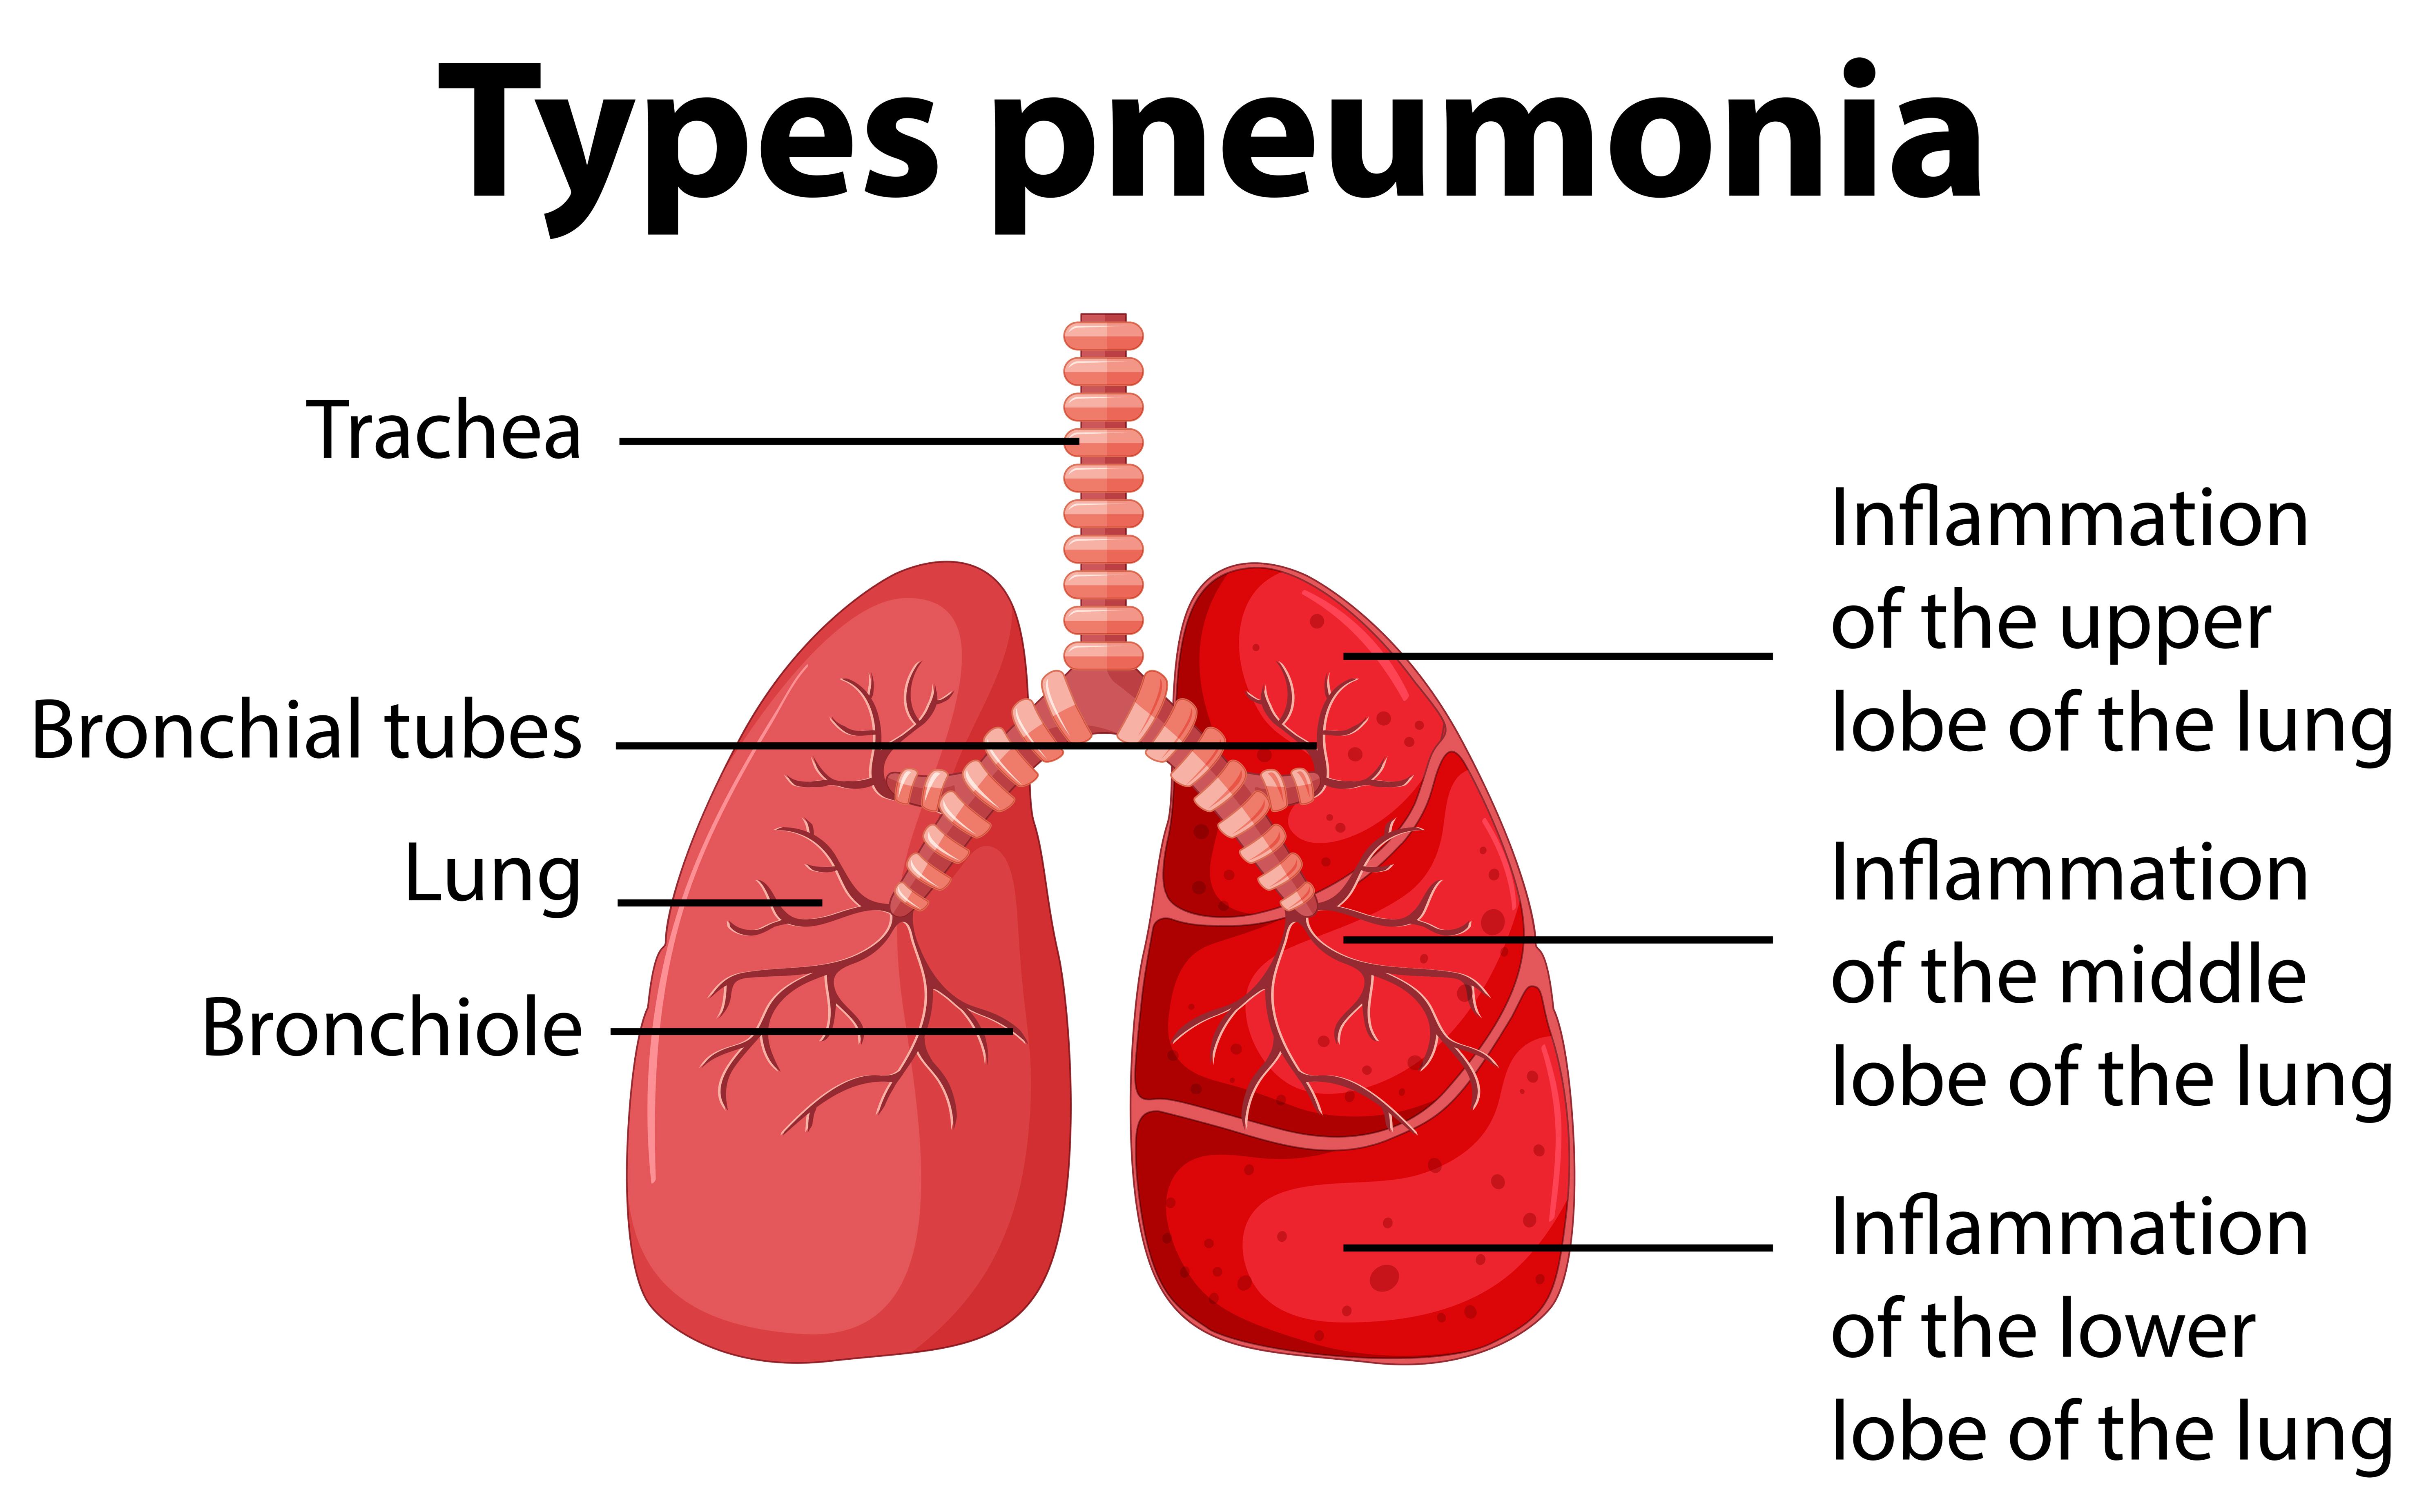 diagram showing types pneumonia download free vectors